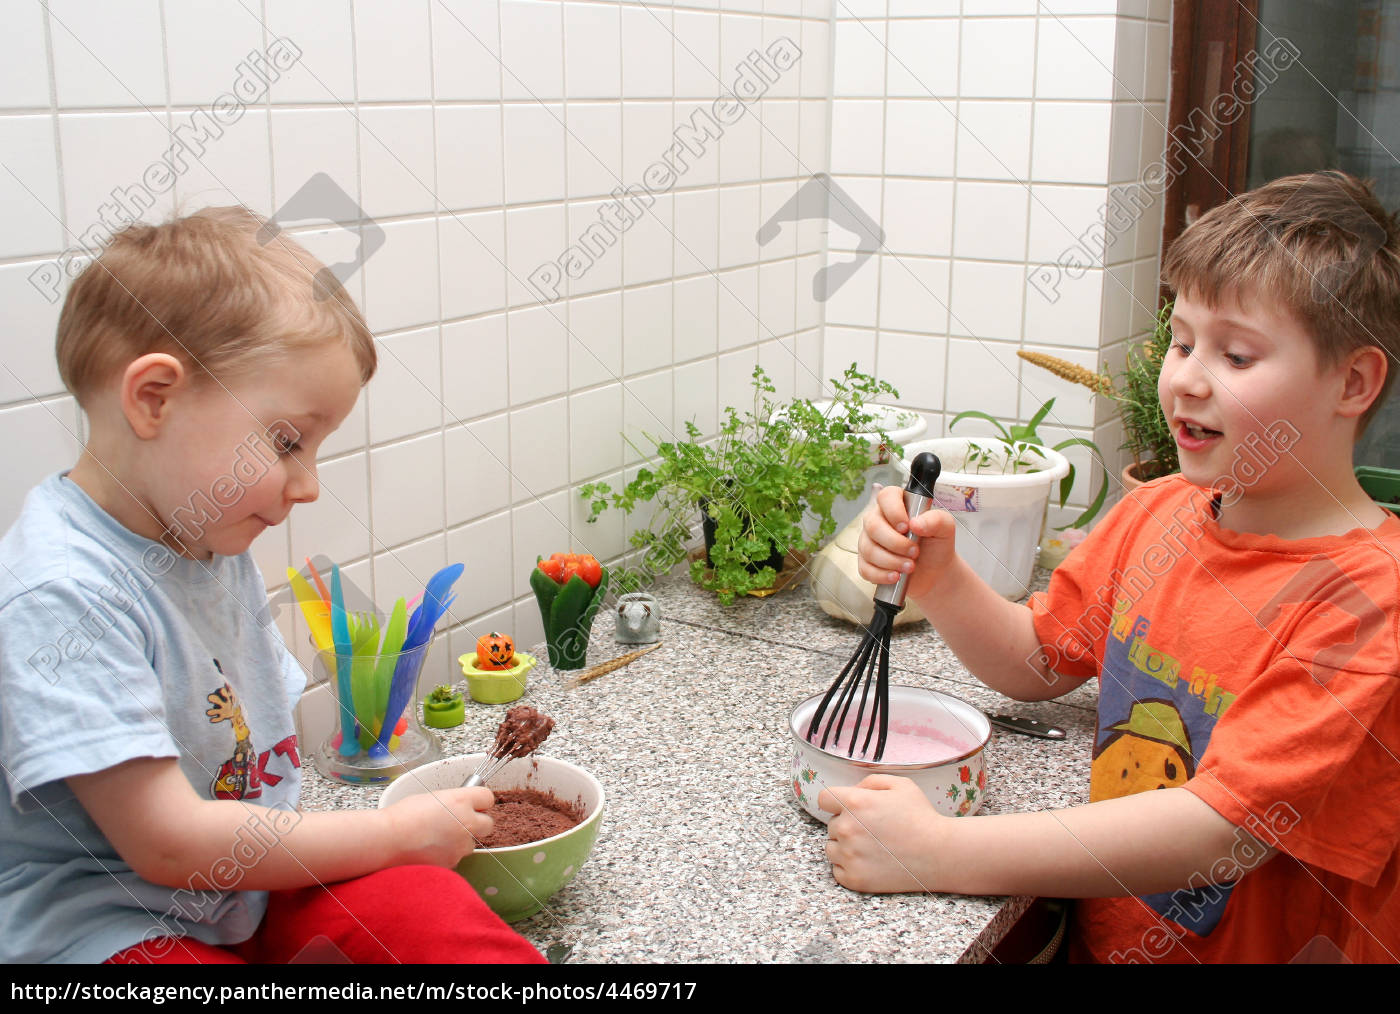 w, kuchni - 4469717